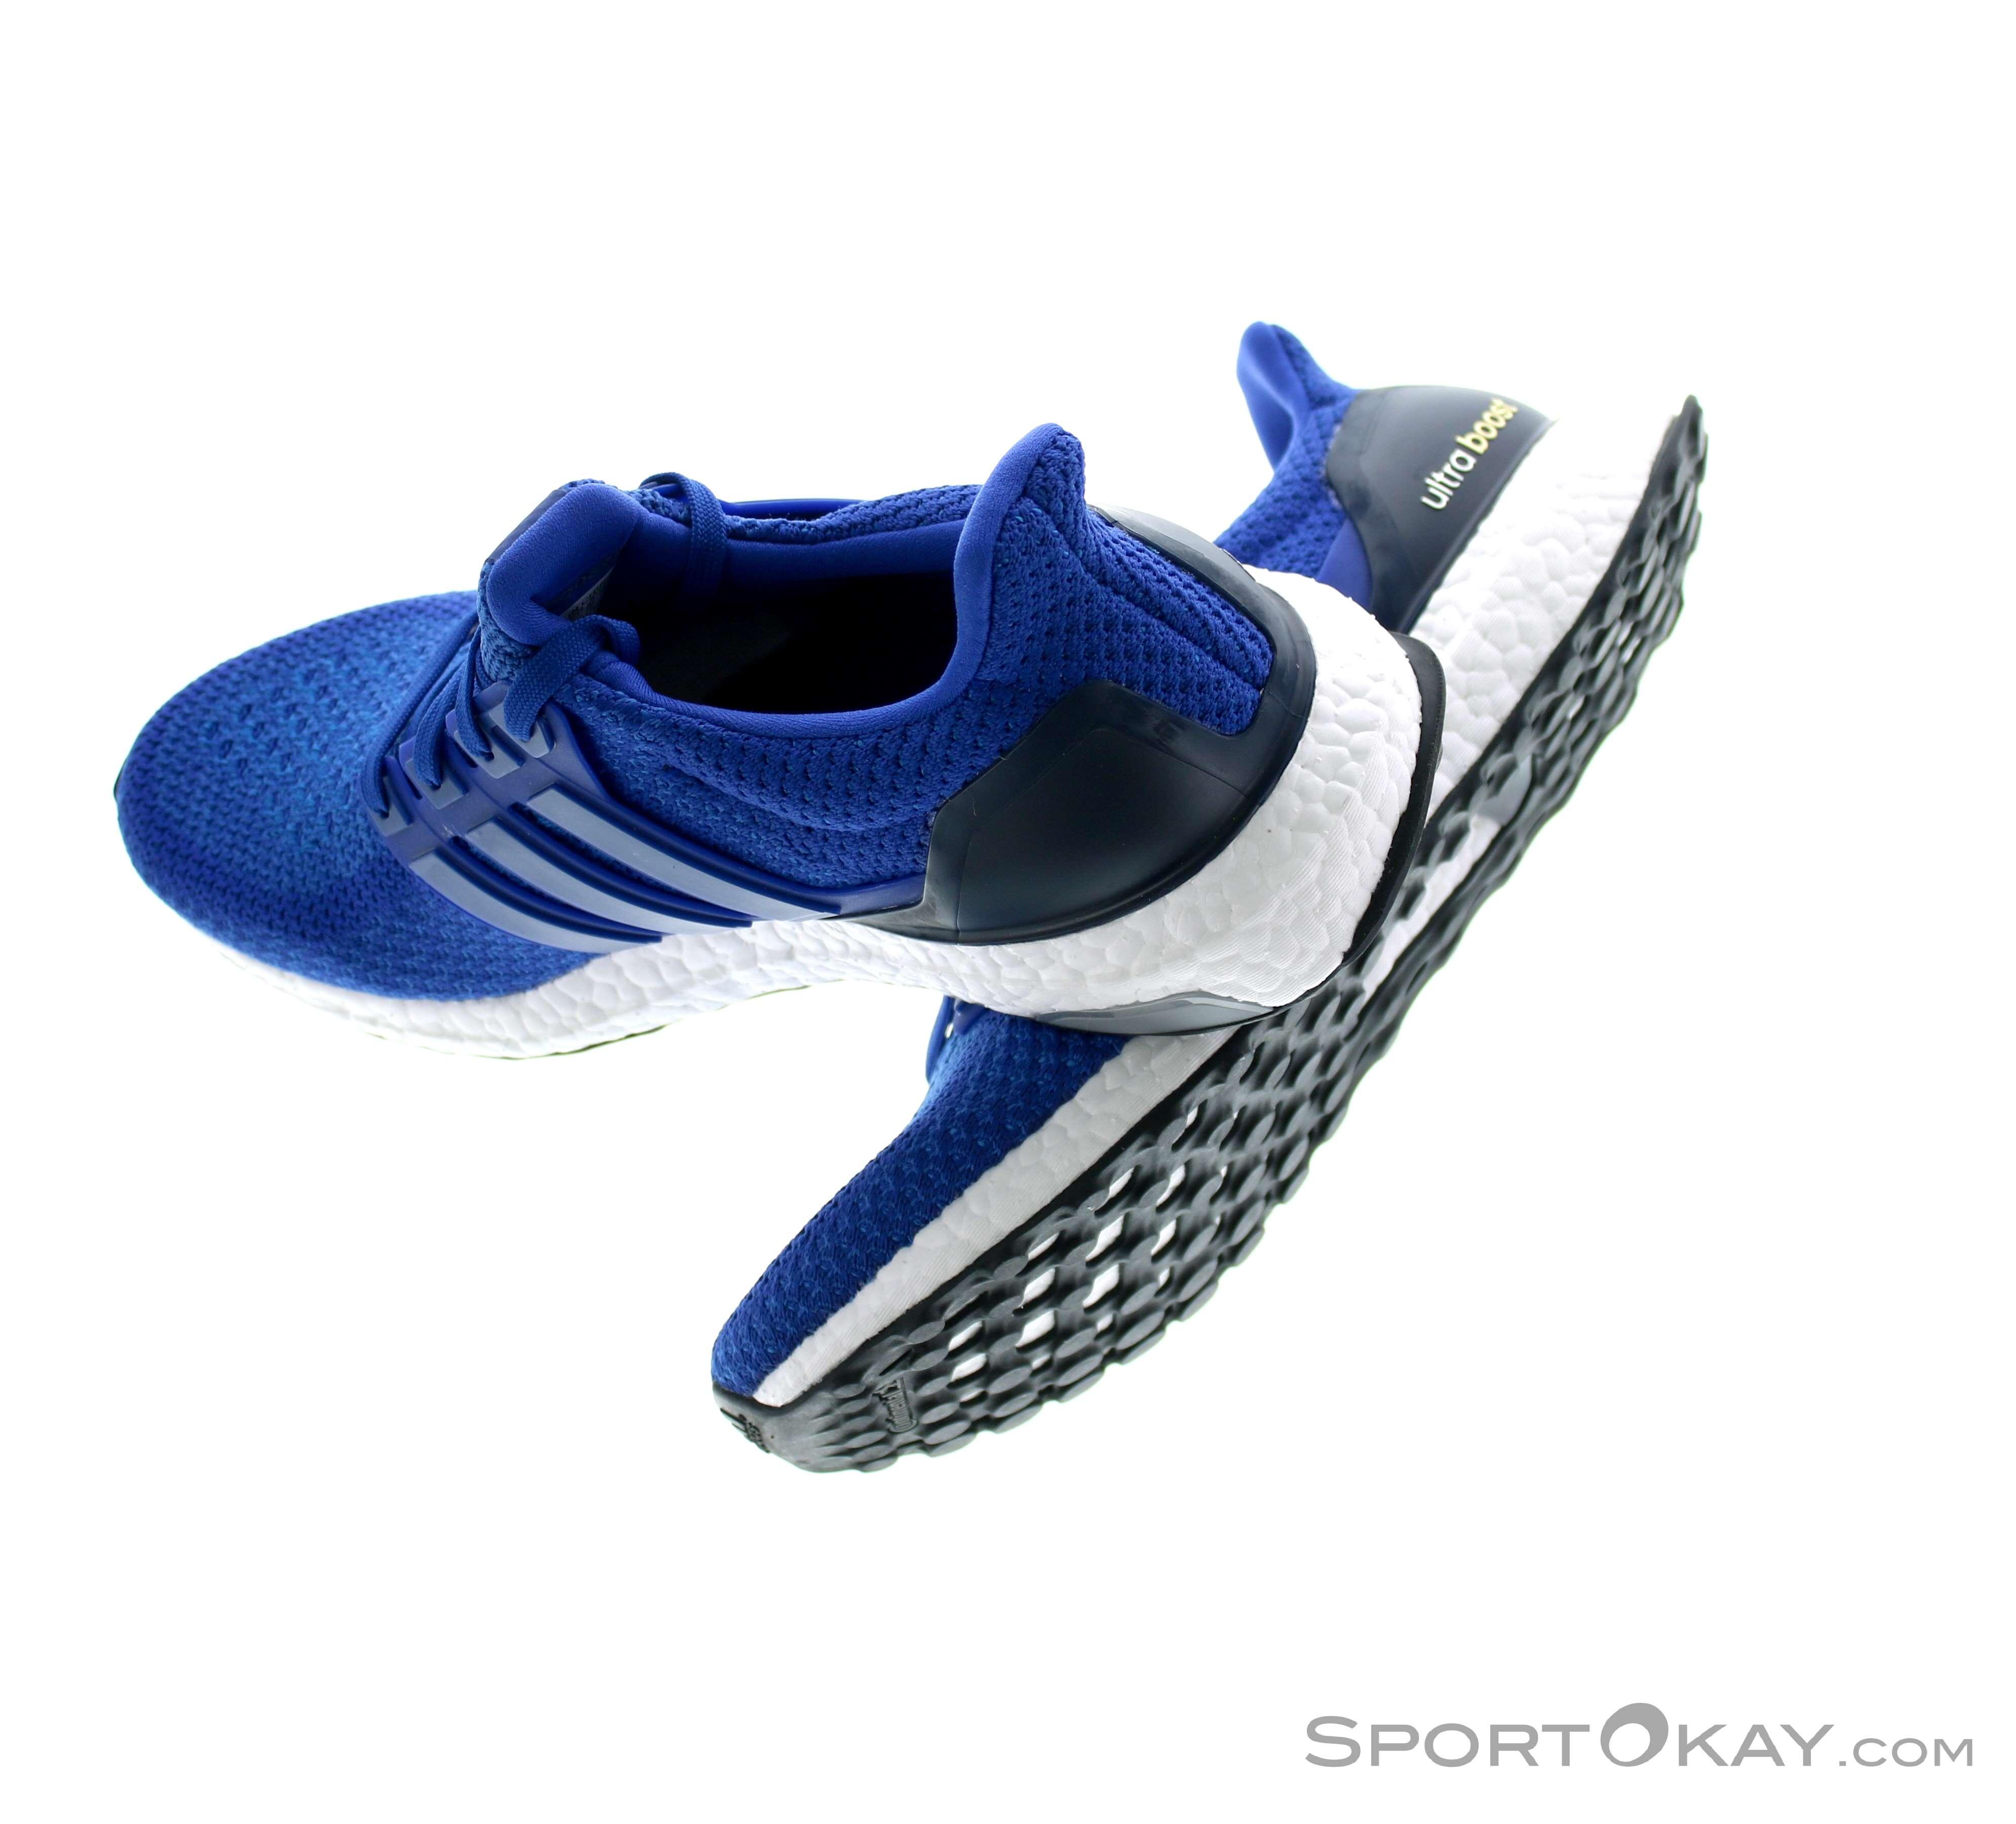 huge selection of fd8b8 b1aef adidas Ultra Boost M Herren Laufschuhe, adidas, Blau, , Herren, 0002-